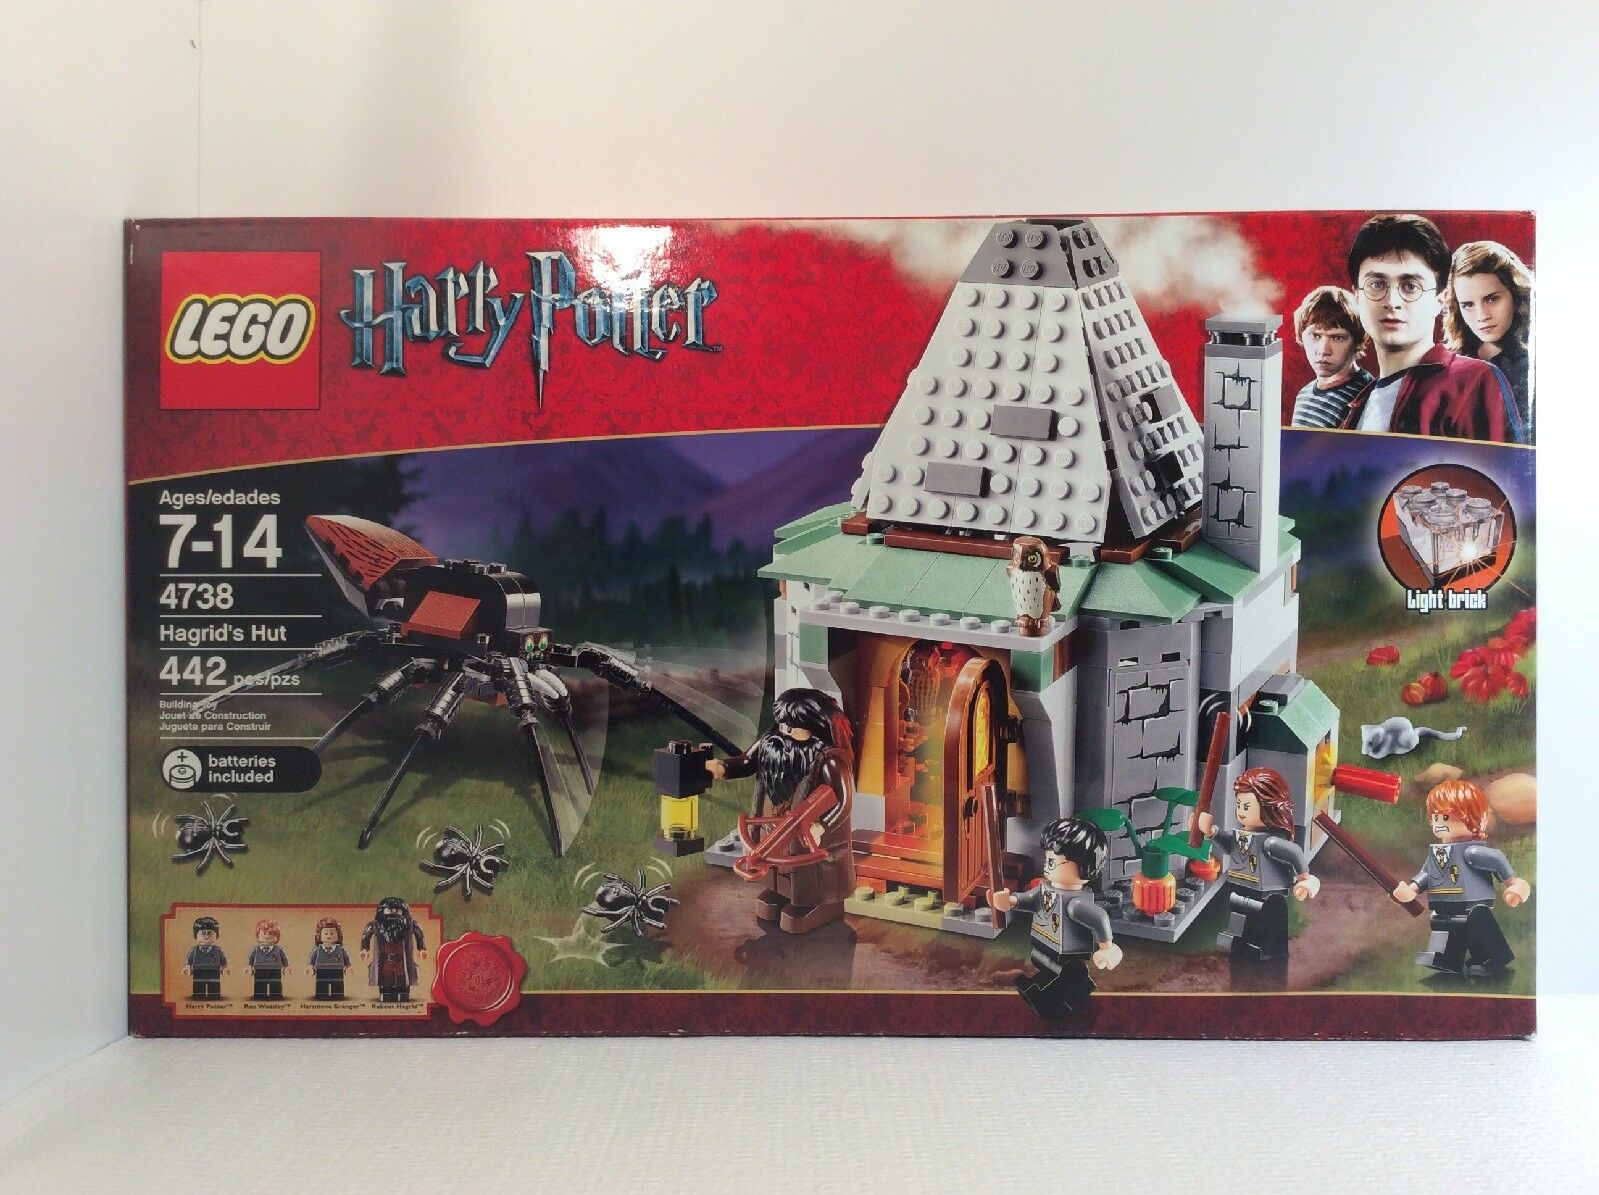 LEGO Harry Potter 4738 Hagrid's Hut New In Box, Free Shipping